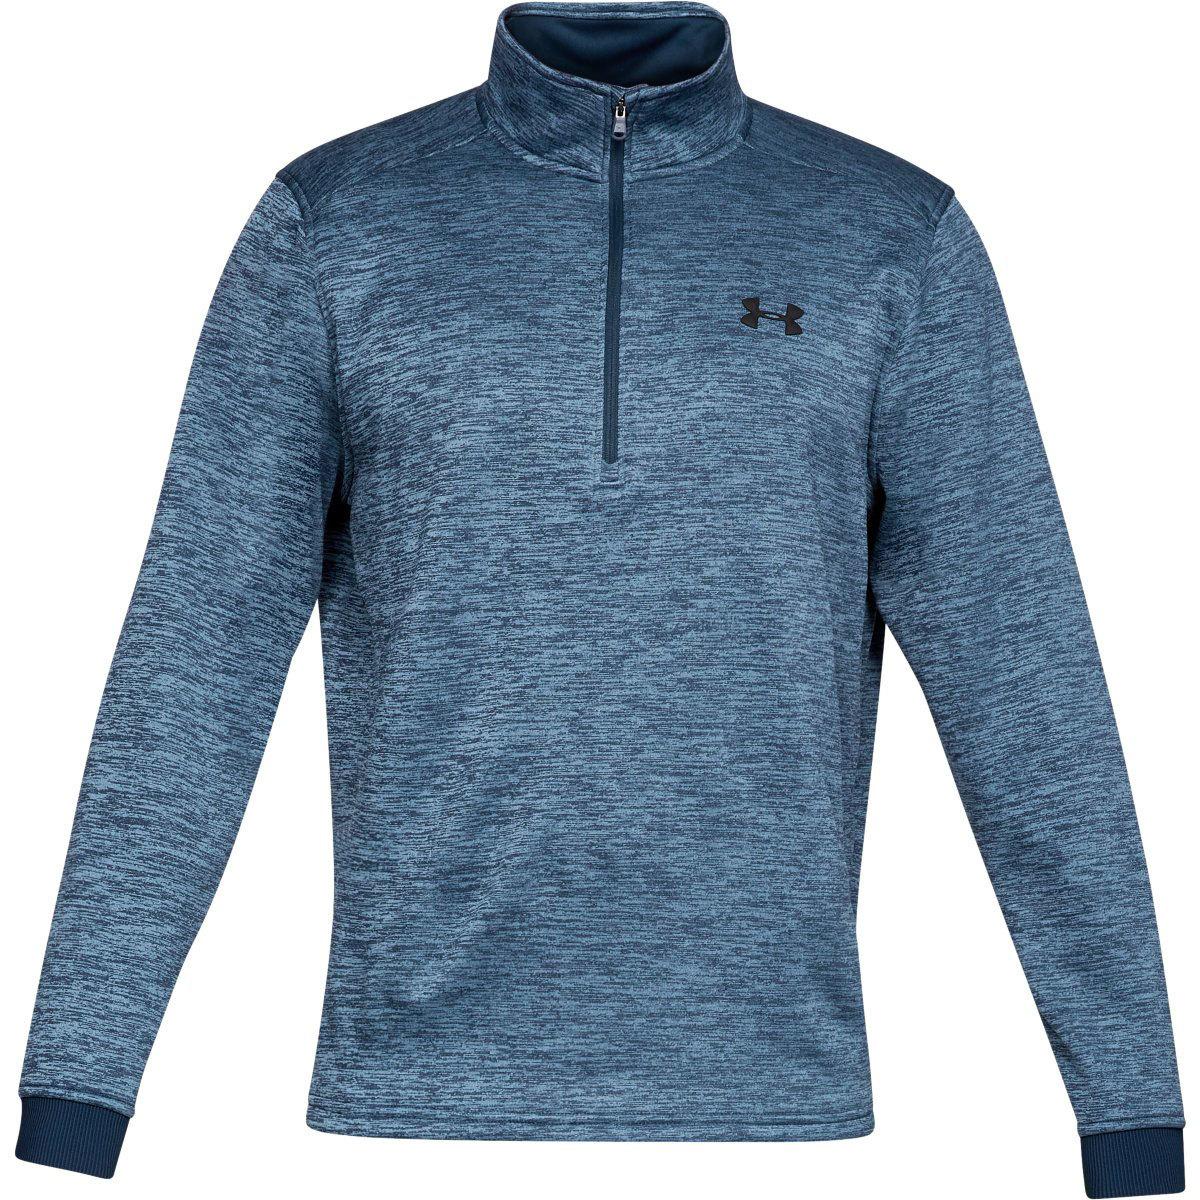 Under Armour Men's Armour Fleece Half Zip Pullover - Blue, L